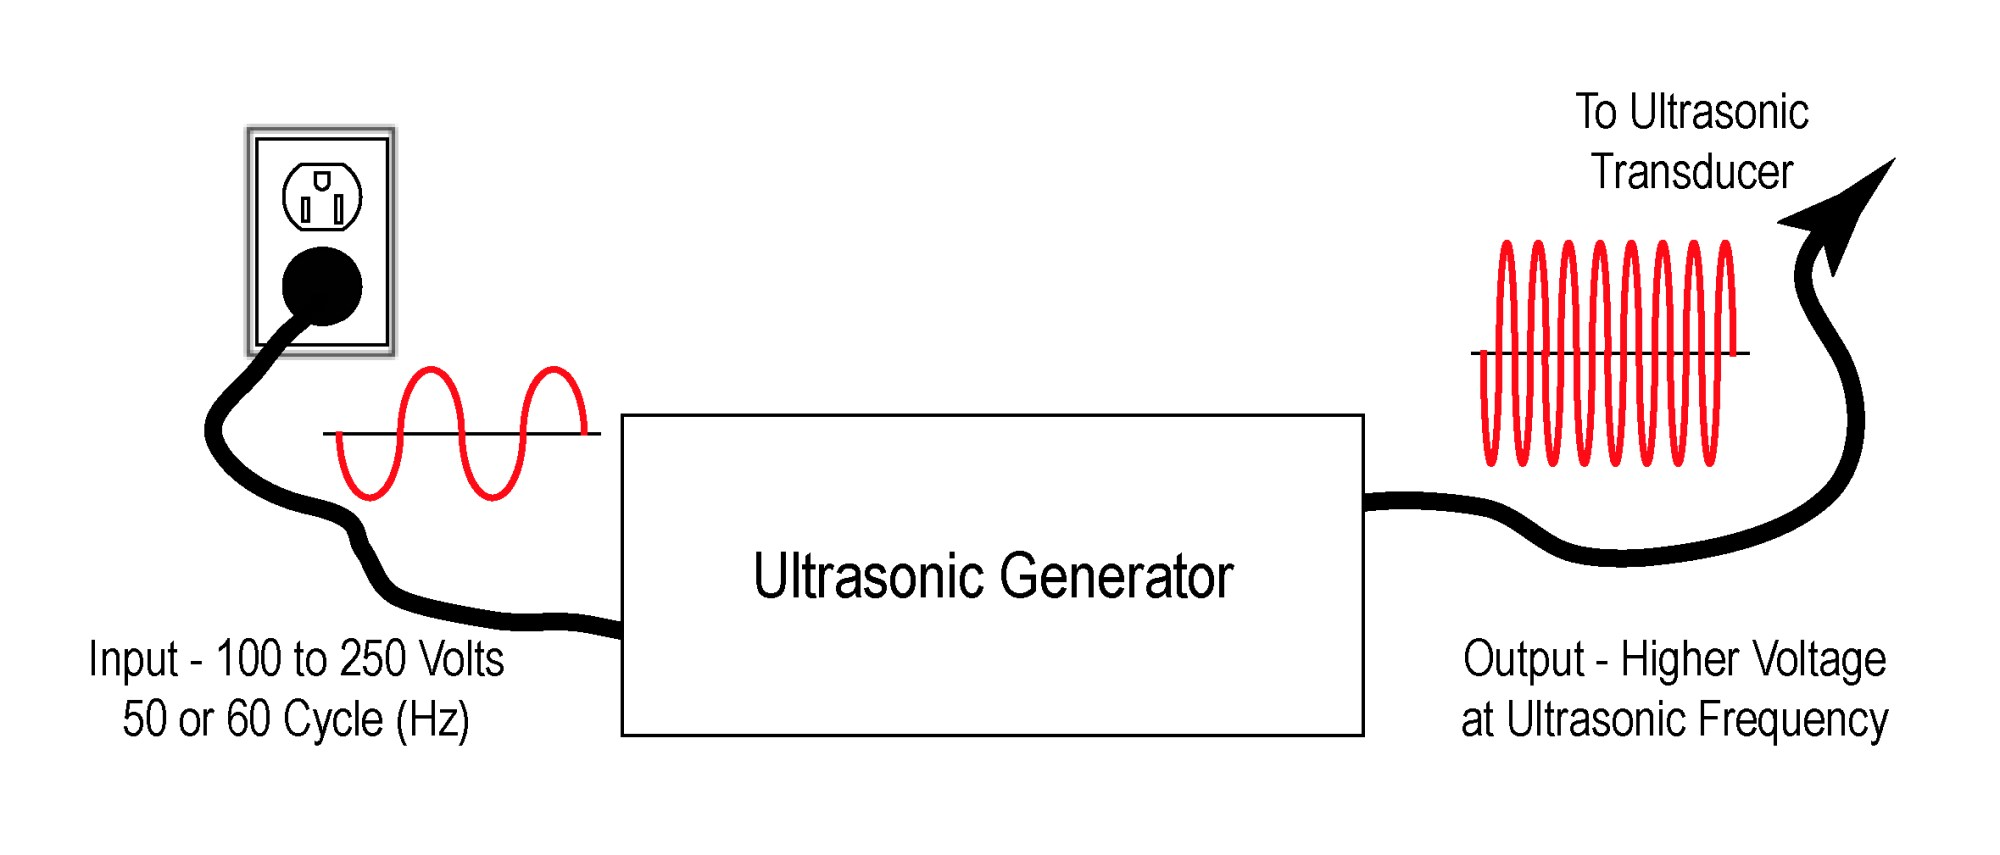 hight resolution of ultrasonics ultrasonic generators introduction ctg technical blog simple ultrasonic wave generator simple circuit diagram